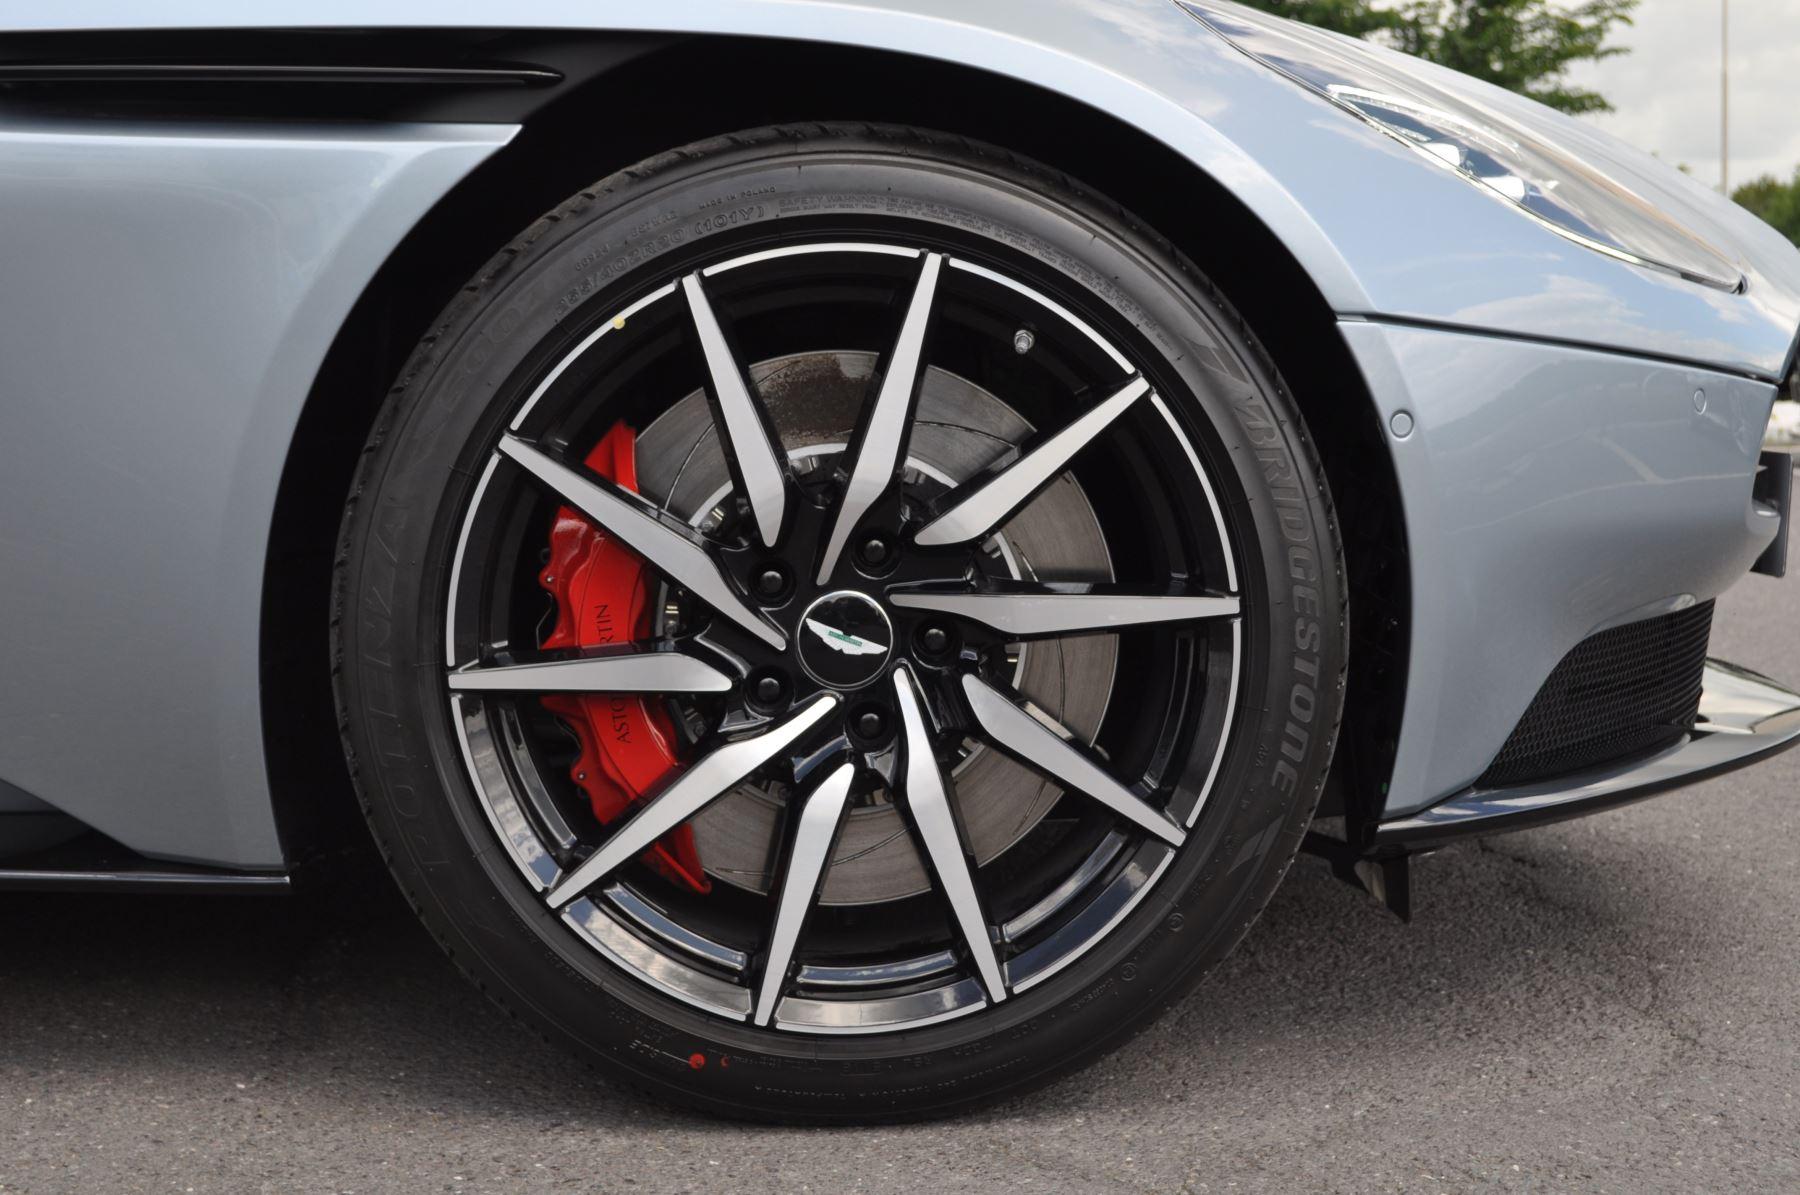 Aston Martin DB11 V8 Touchtronic image 20